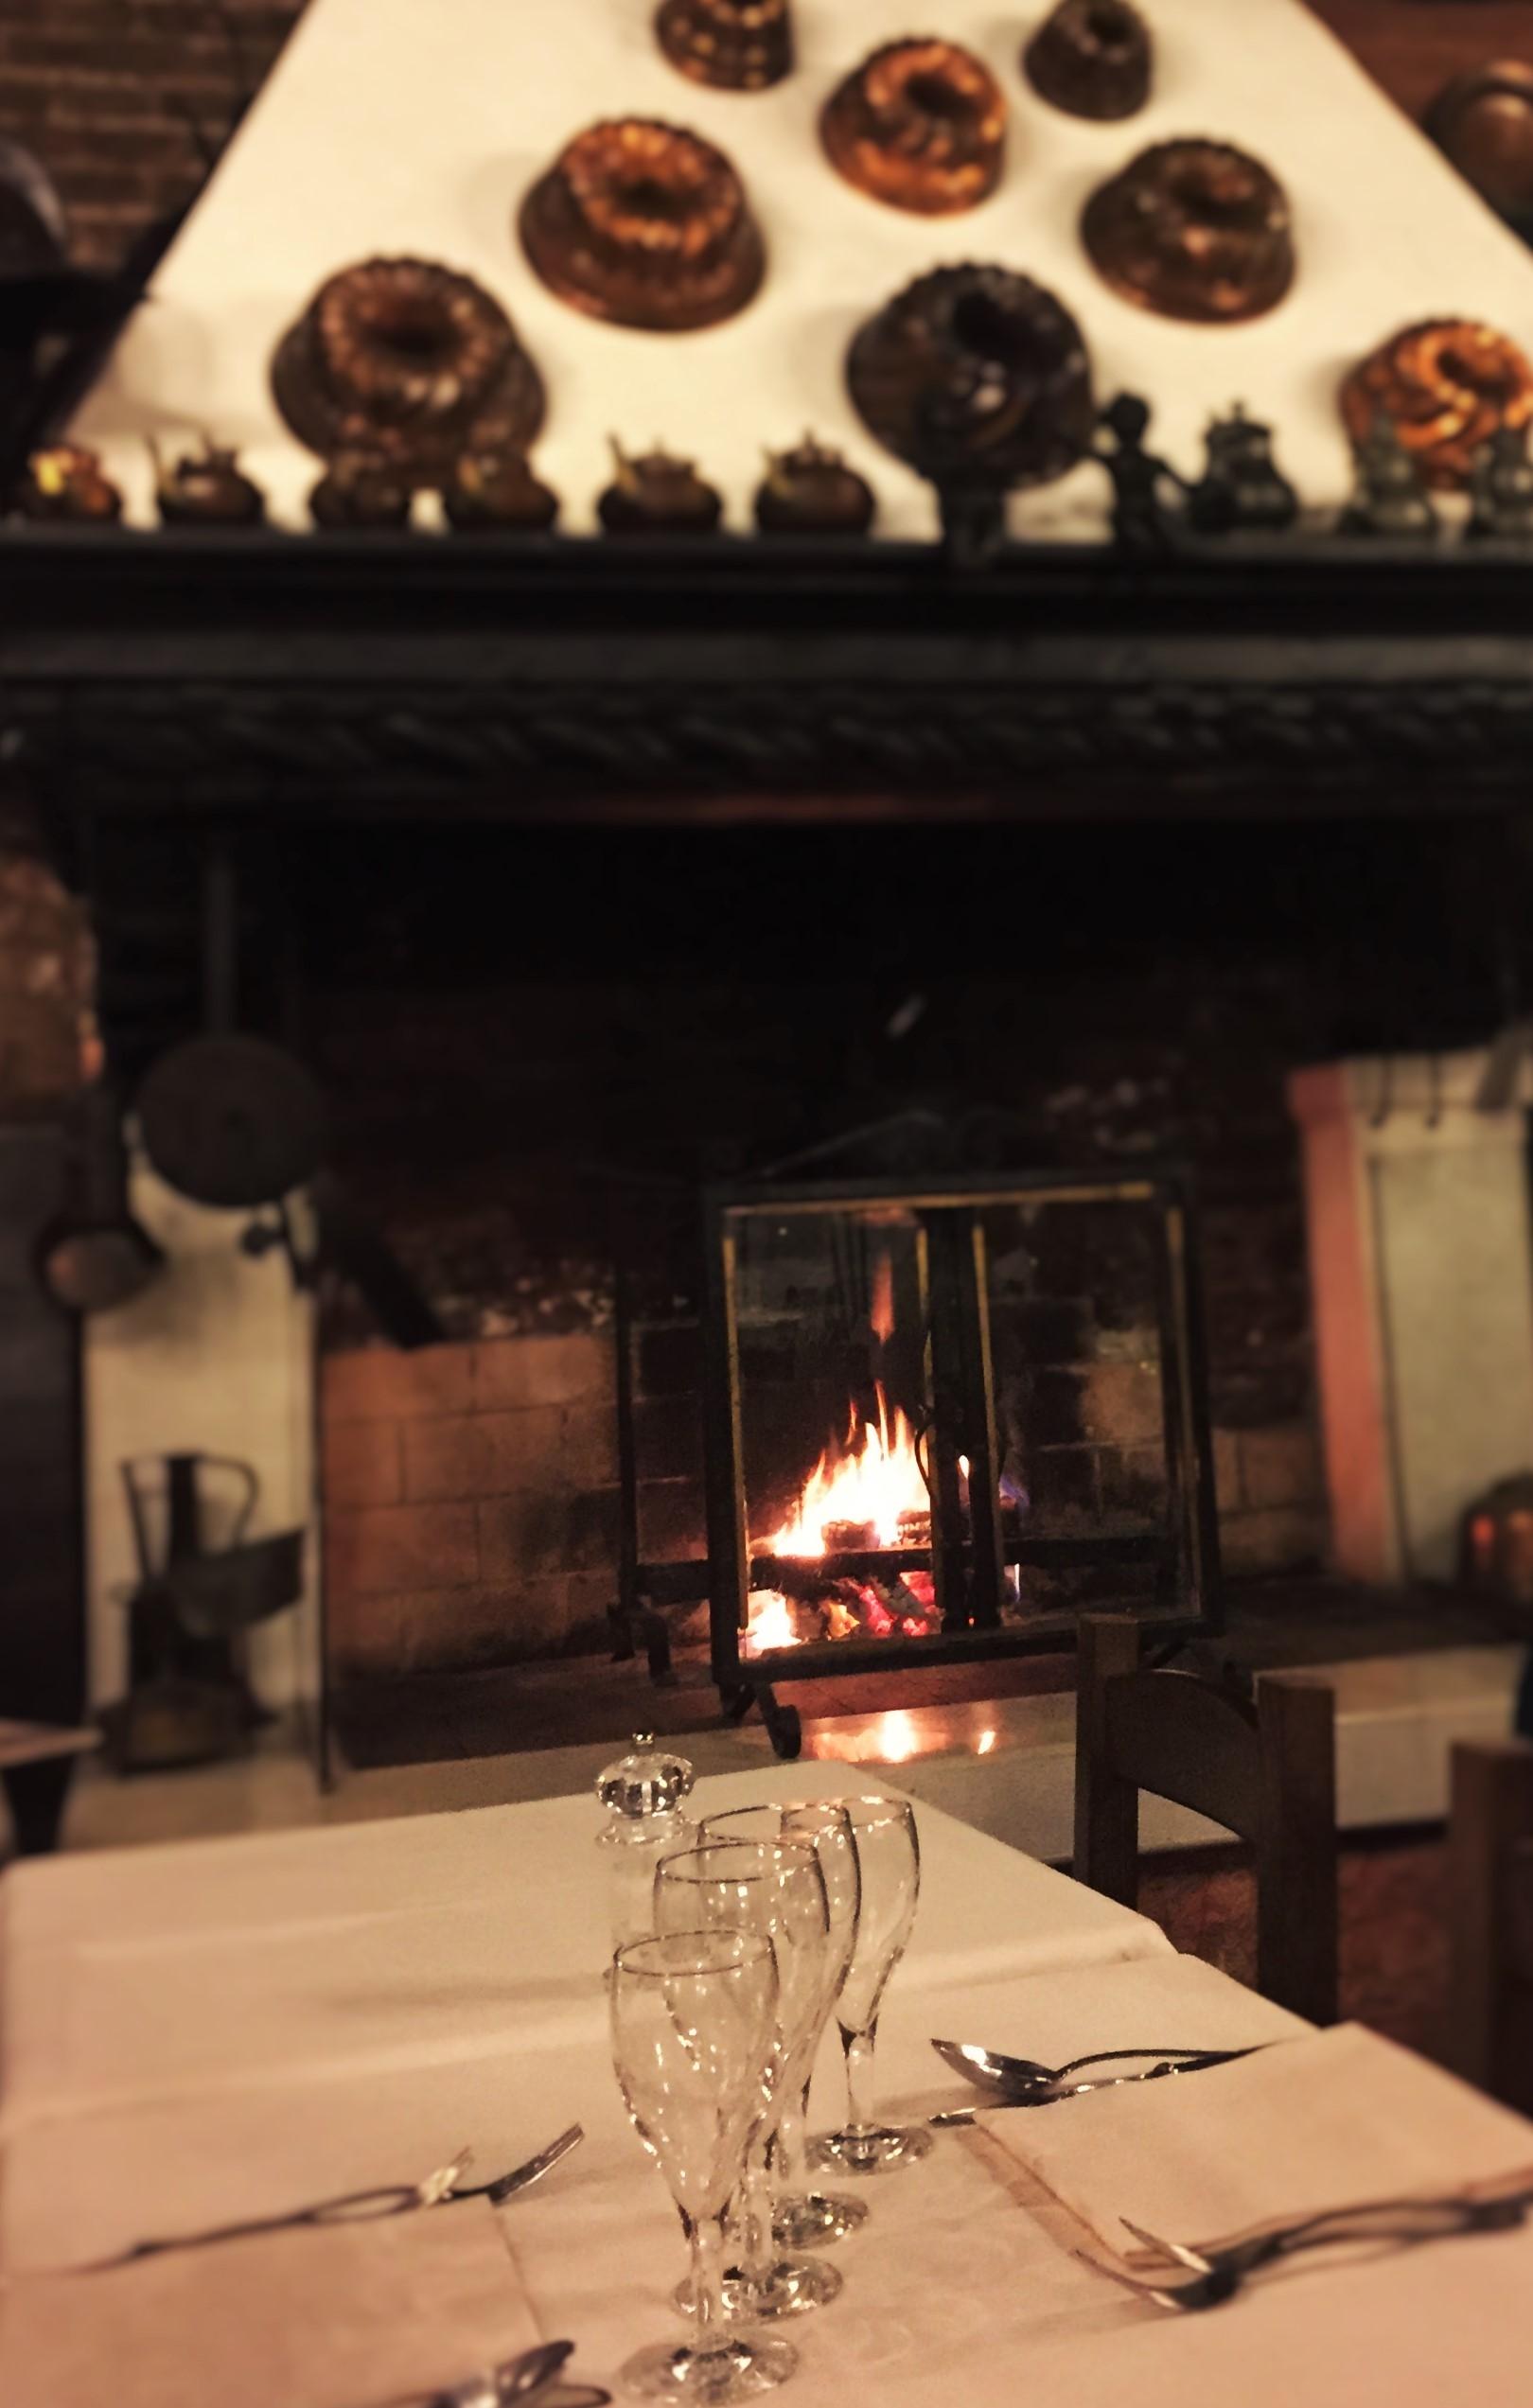 Fireside dining at Ristorante da Raffaele in Venice. Photo credit: M. Ciavardini